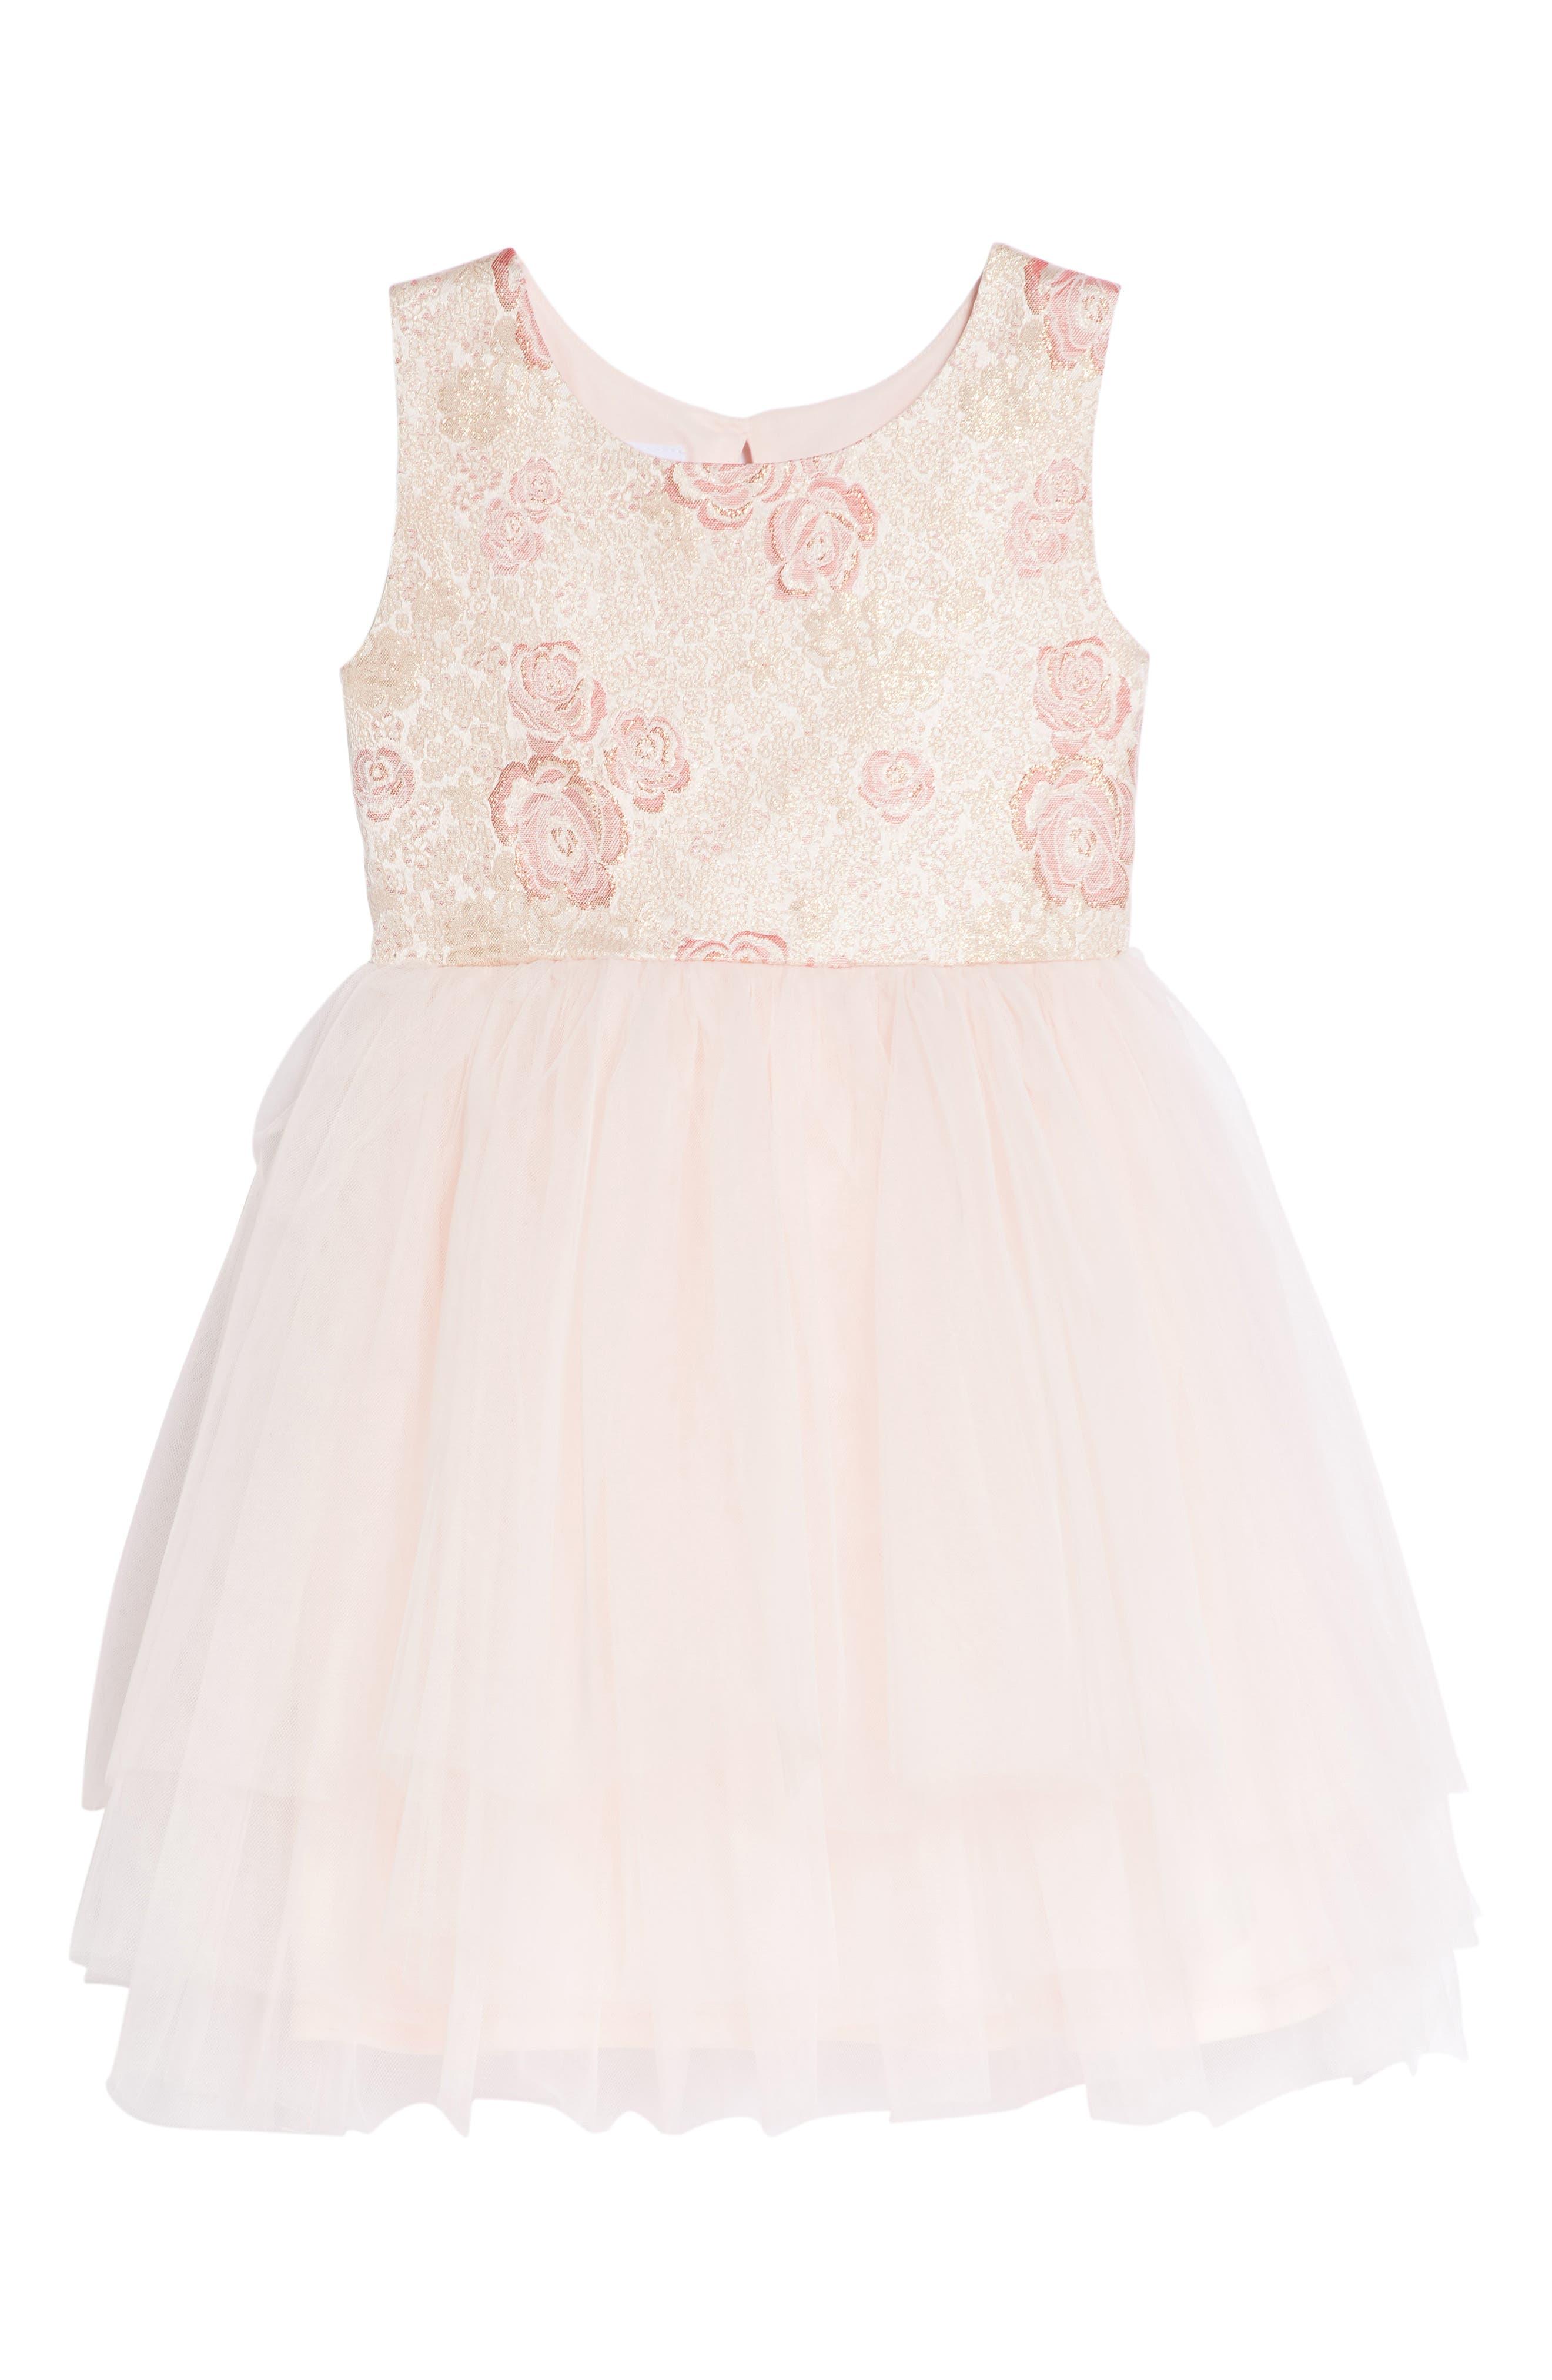 Rose Jacquard Fit & Flare Dress,                         Main,                         color, Light Pink